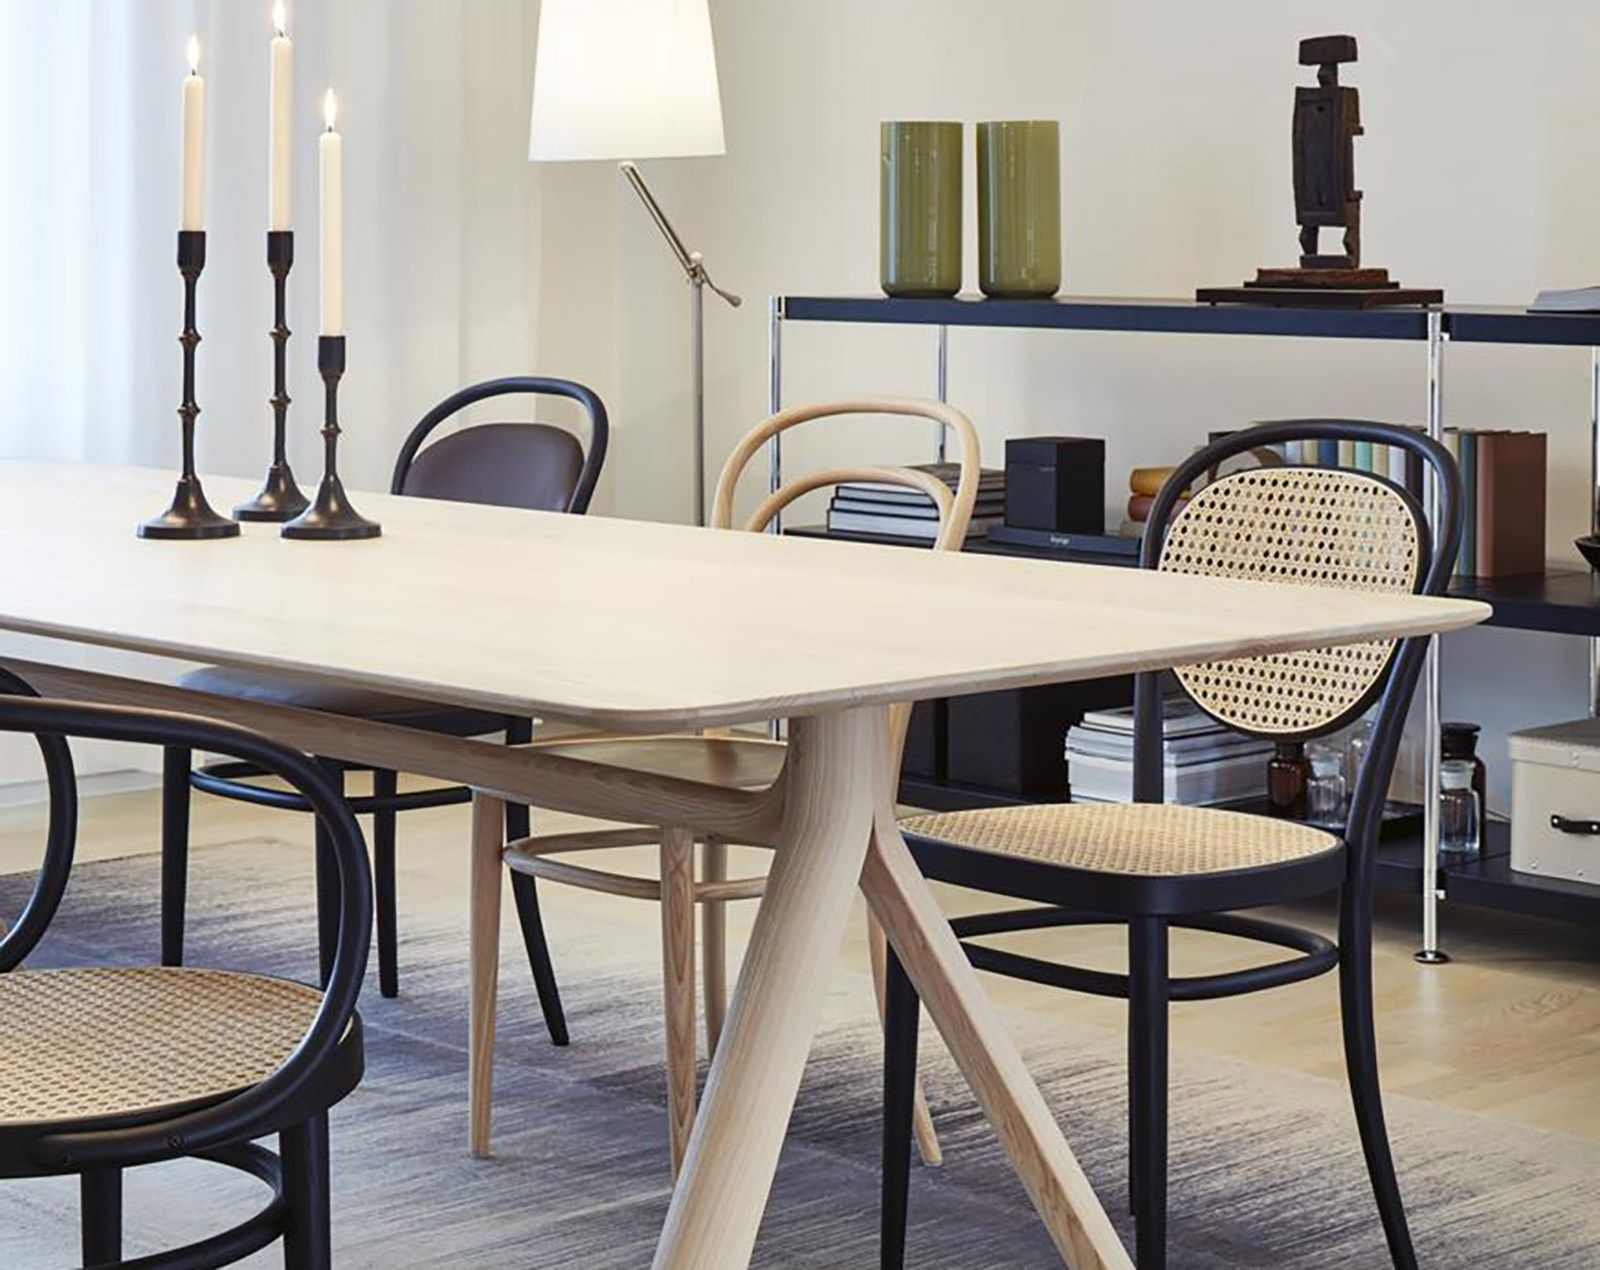 6c59dcaa9a7e54d92f45640a9d1f2cec Incroyable De Table Basse Le Corbusier Concept